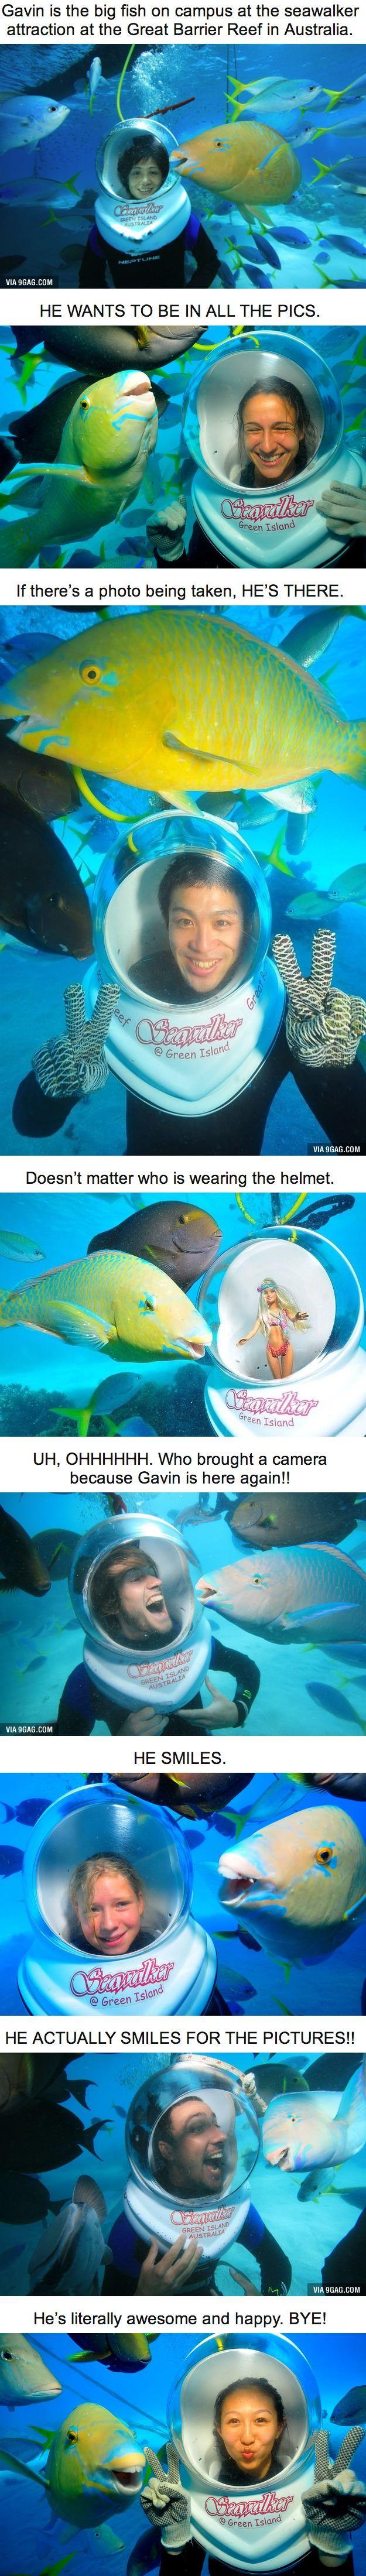 I wanna meet that fish